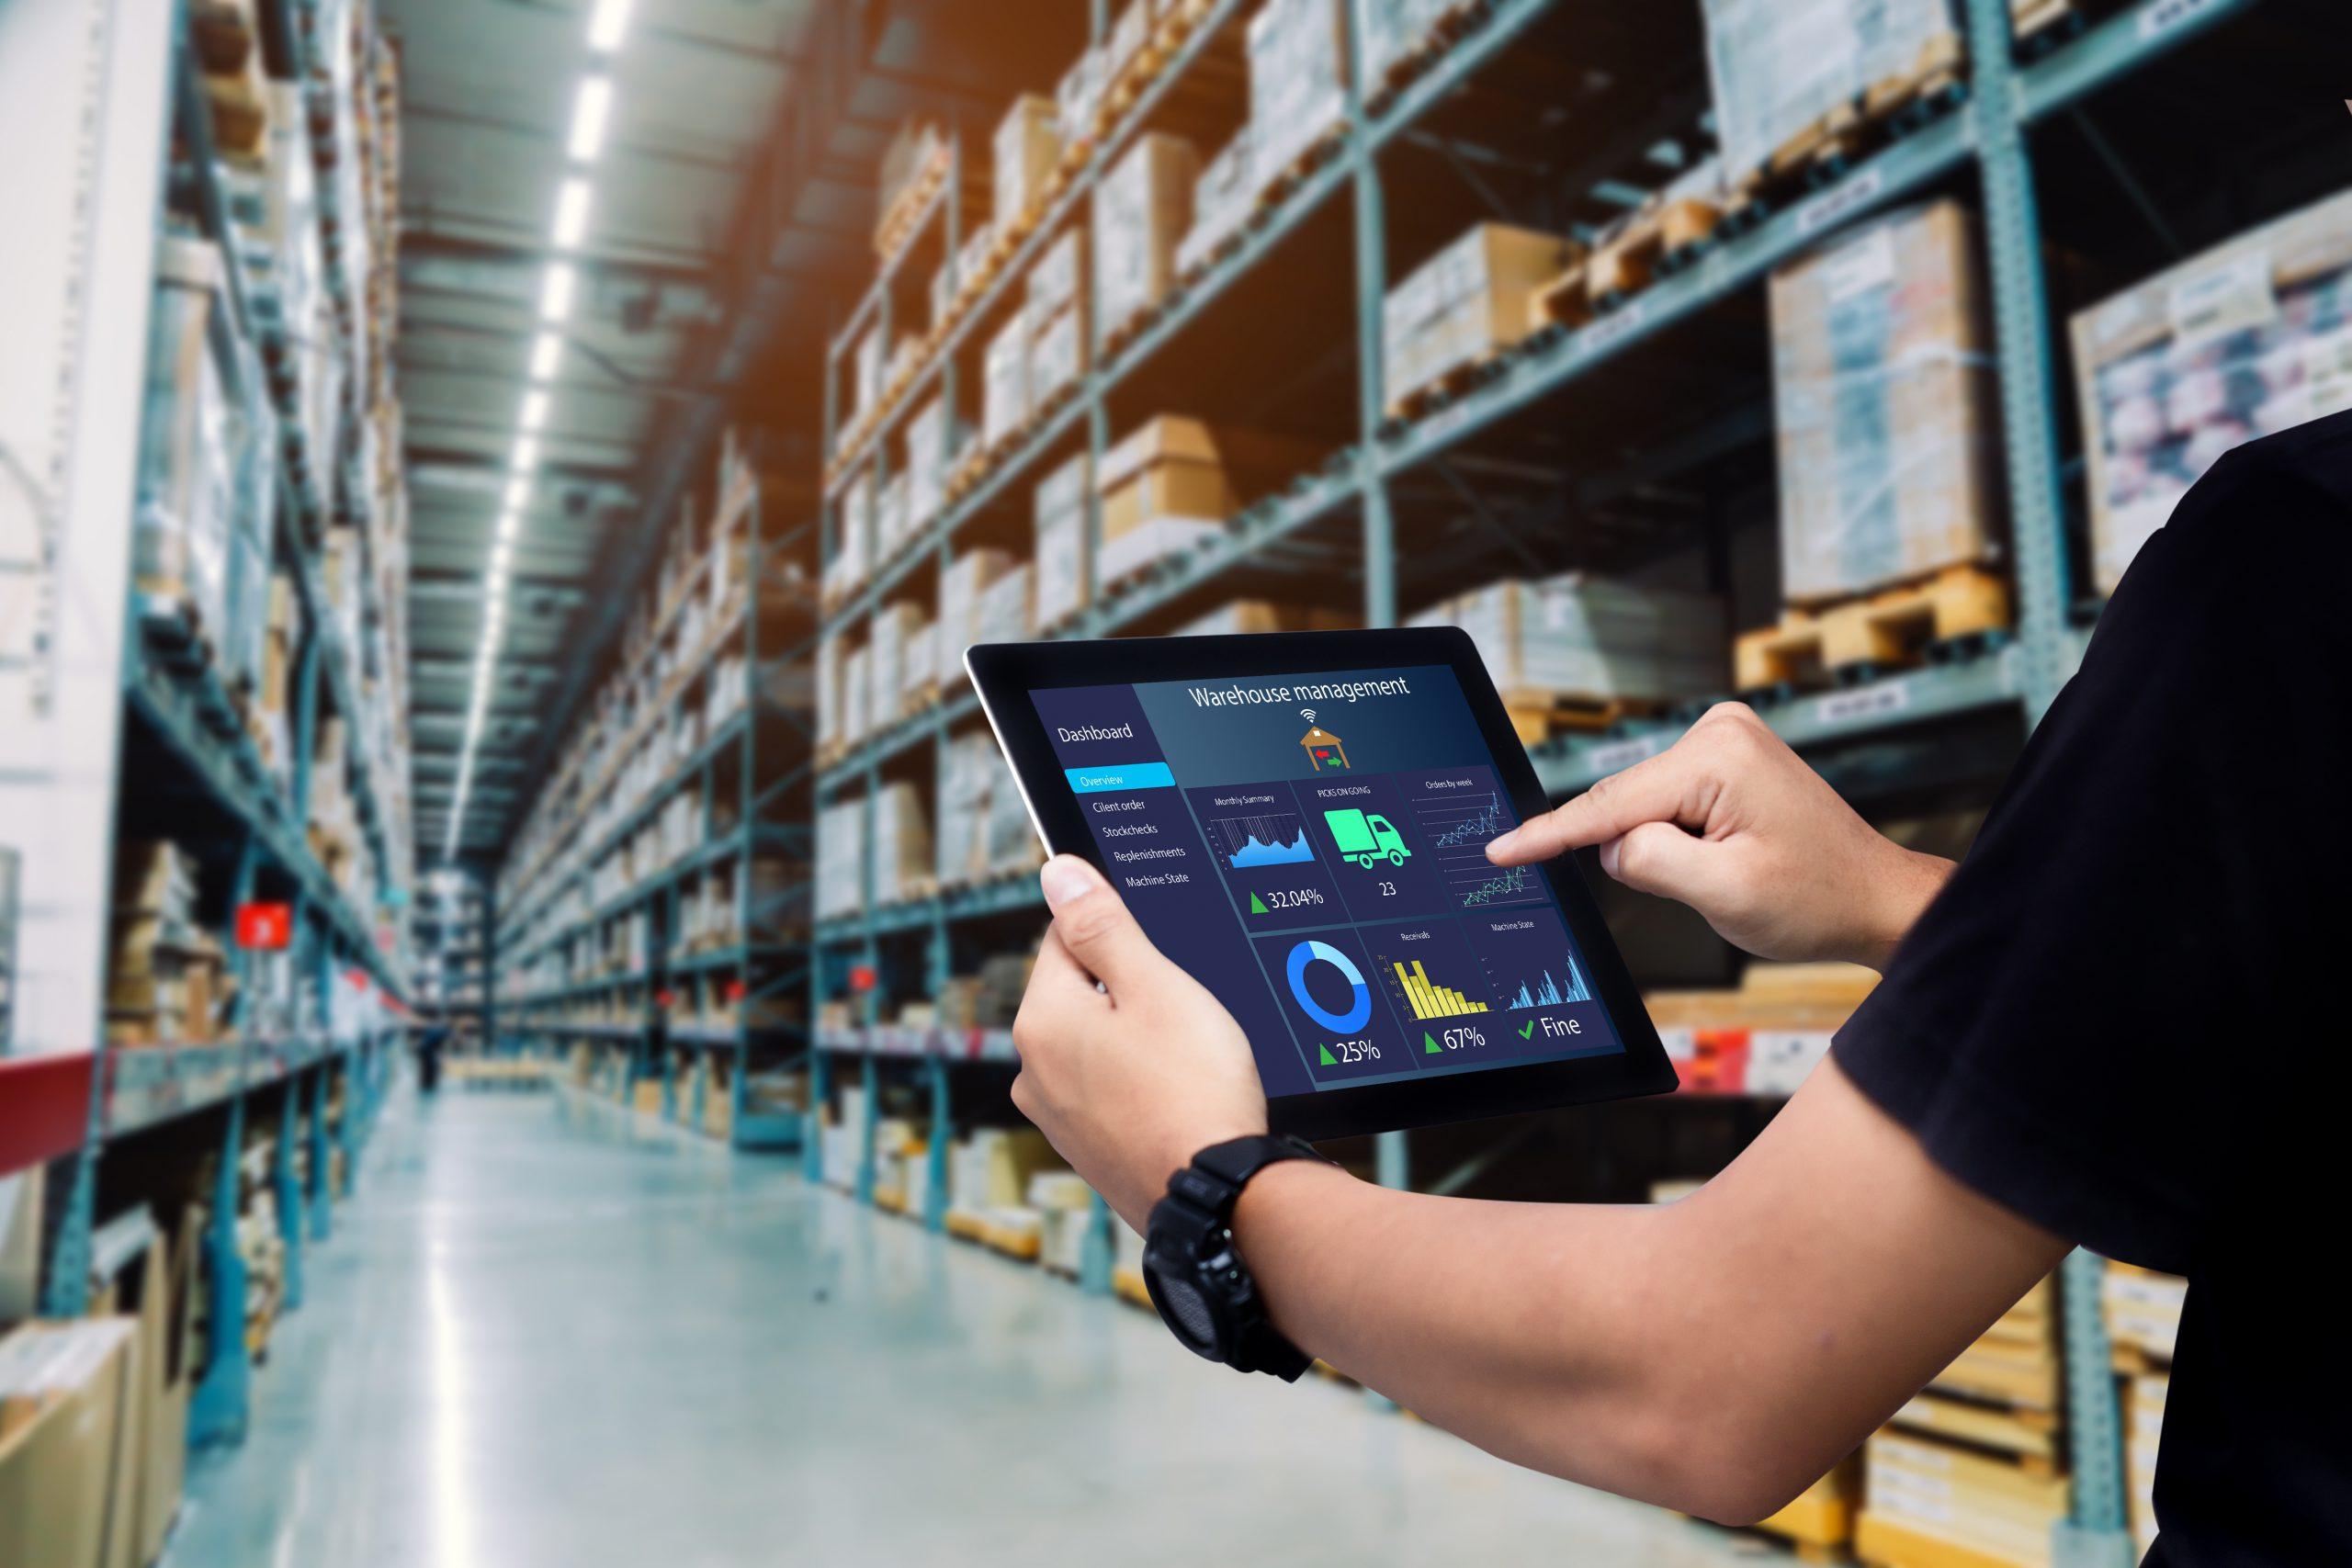 Herausforderungen an eine performante E-Commerce-Logistik